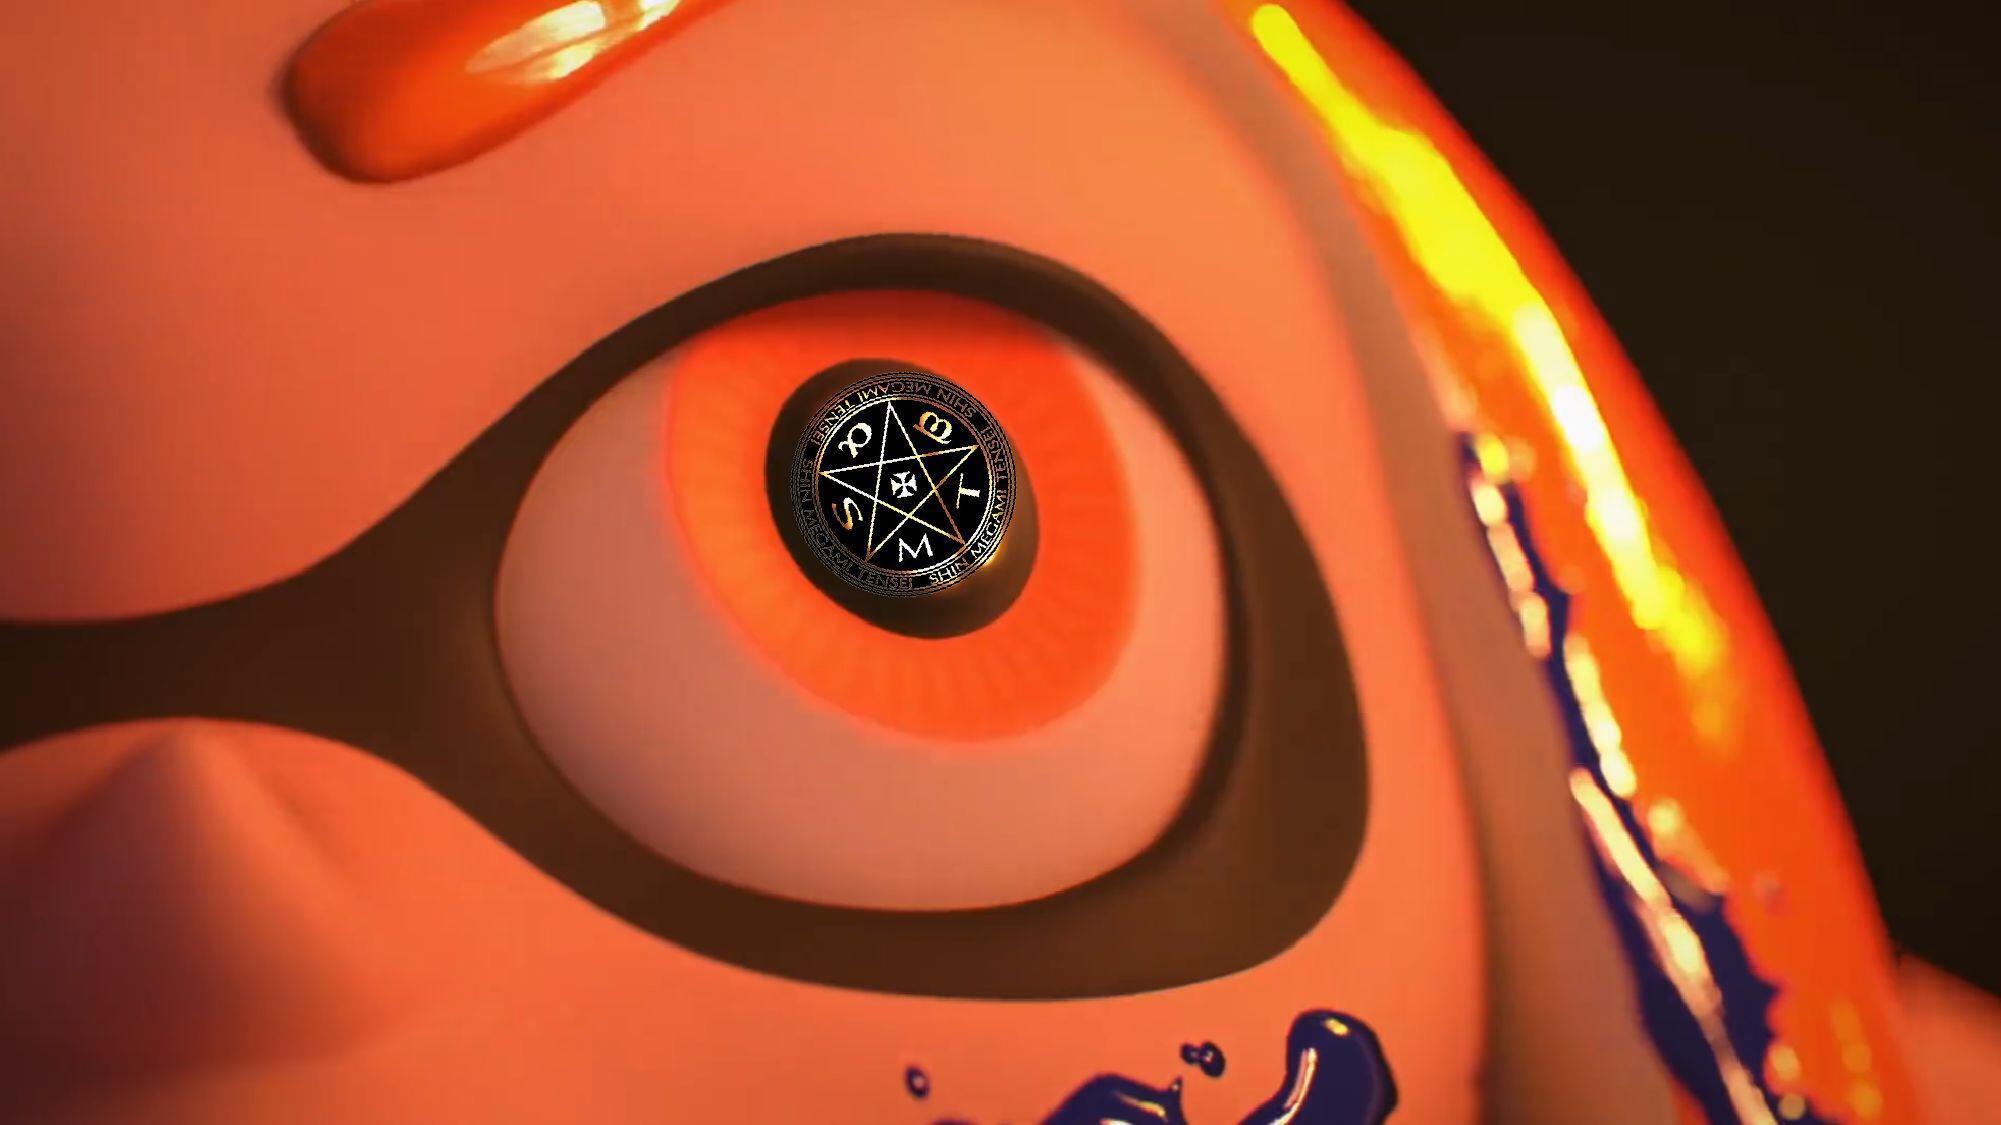 Bruno Mars Review >> Inkling Confirmed For Shin Megami Tensei V | Inkling Girl's Eye | Know Your Meme